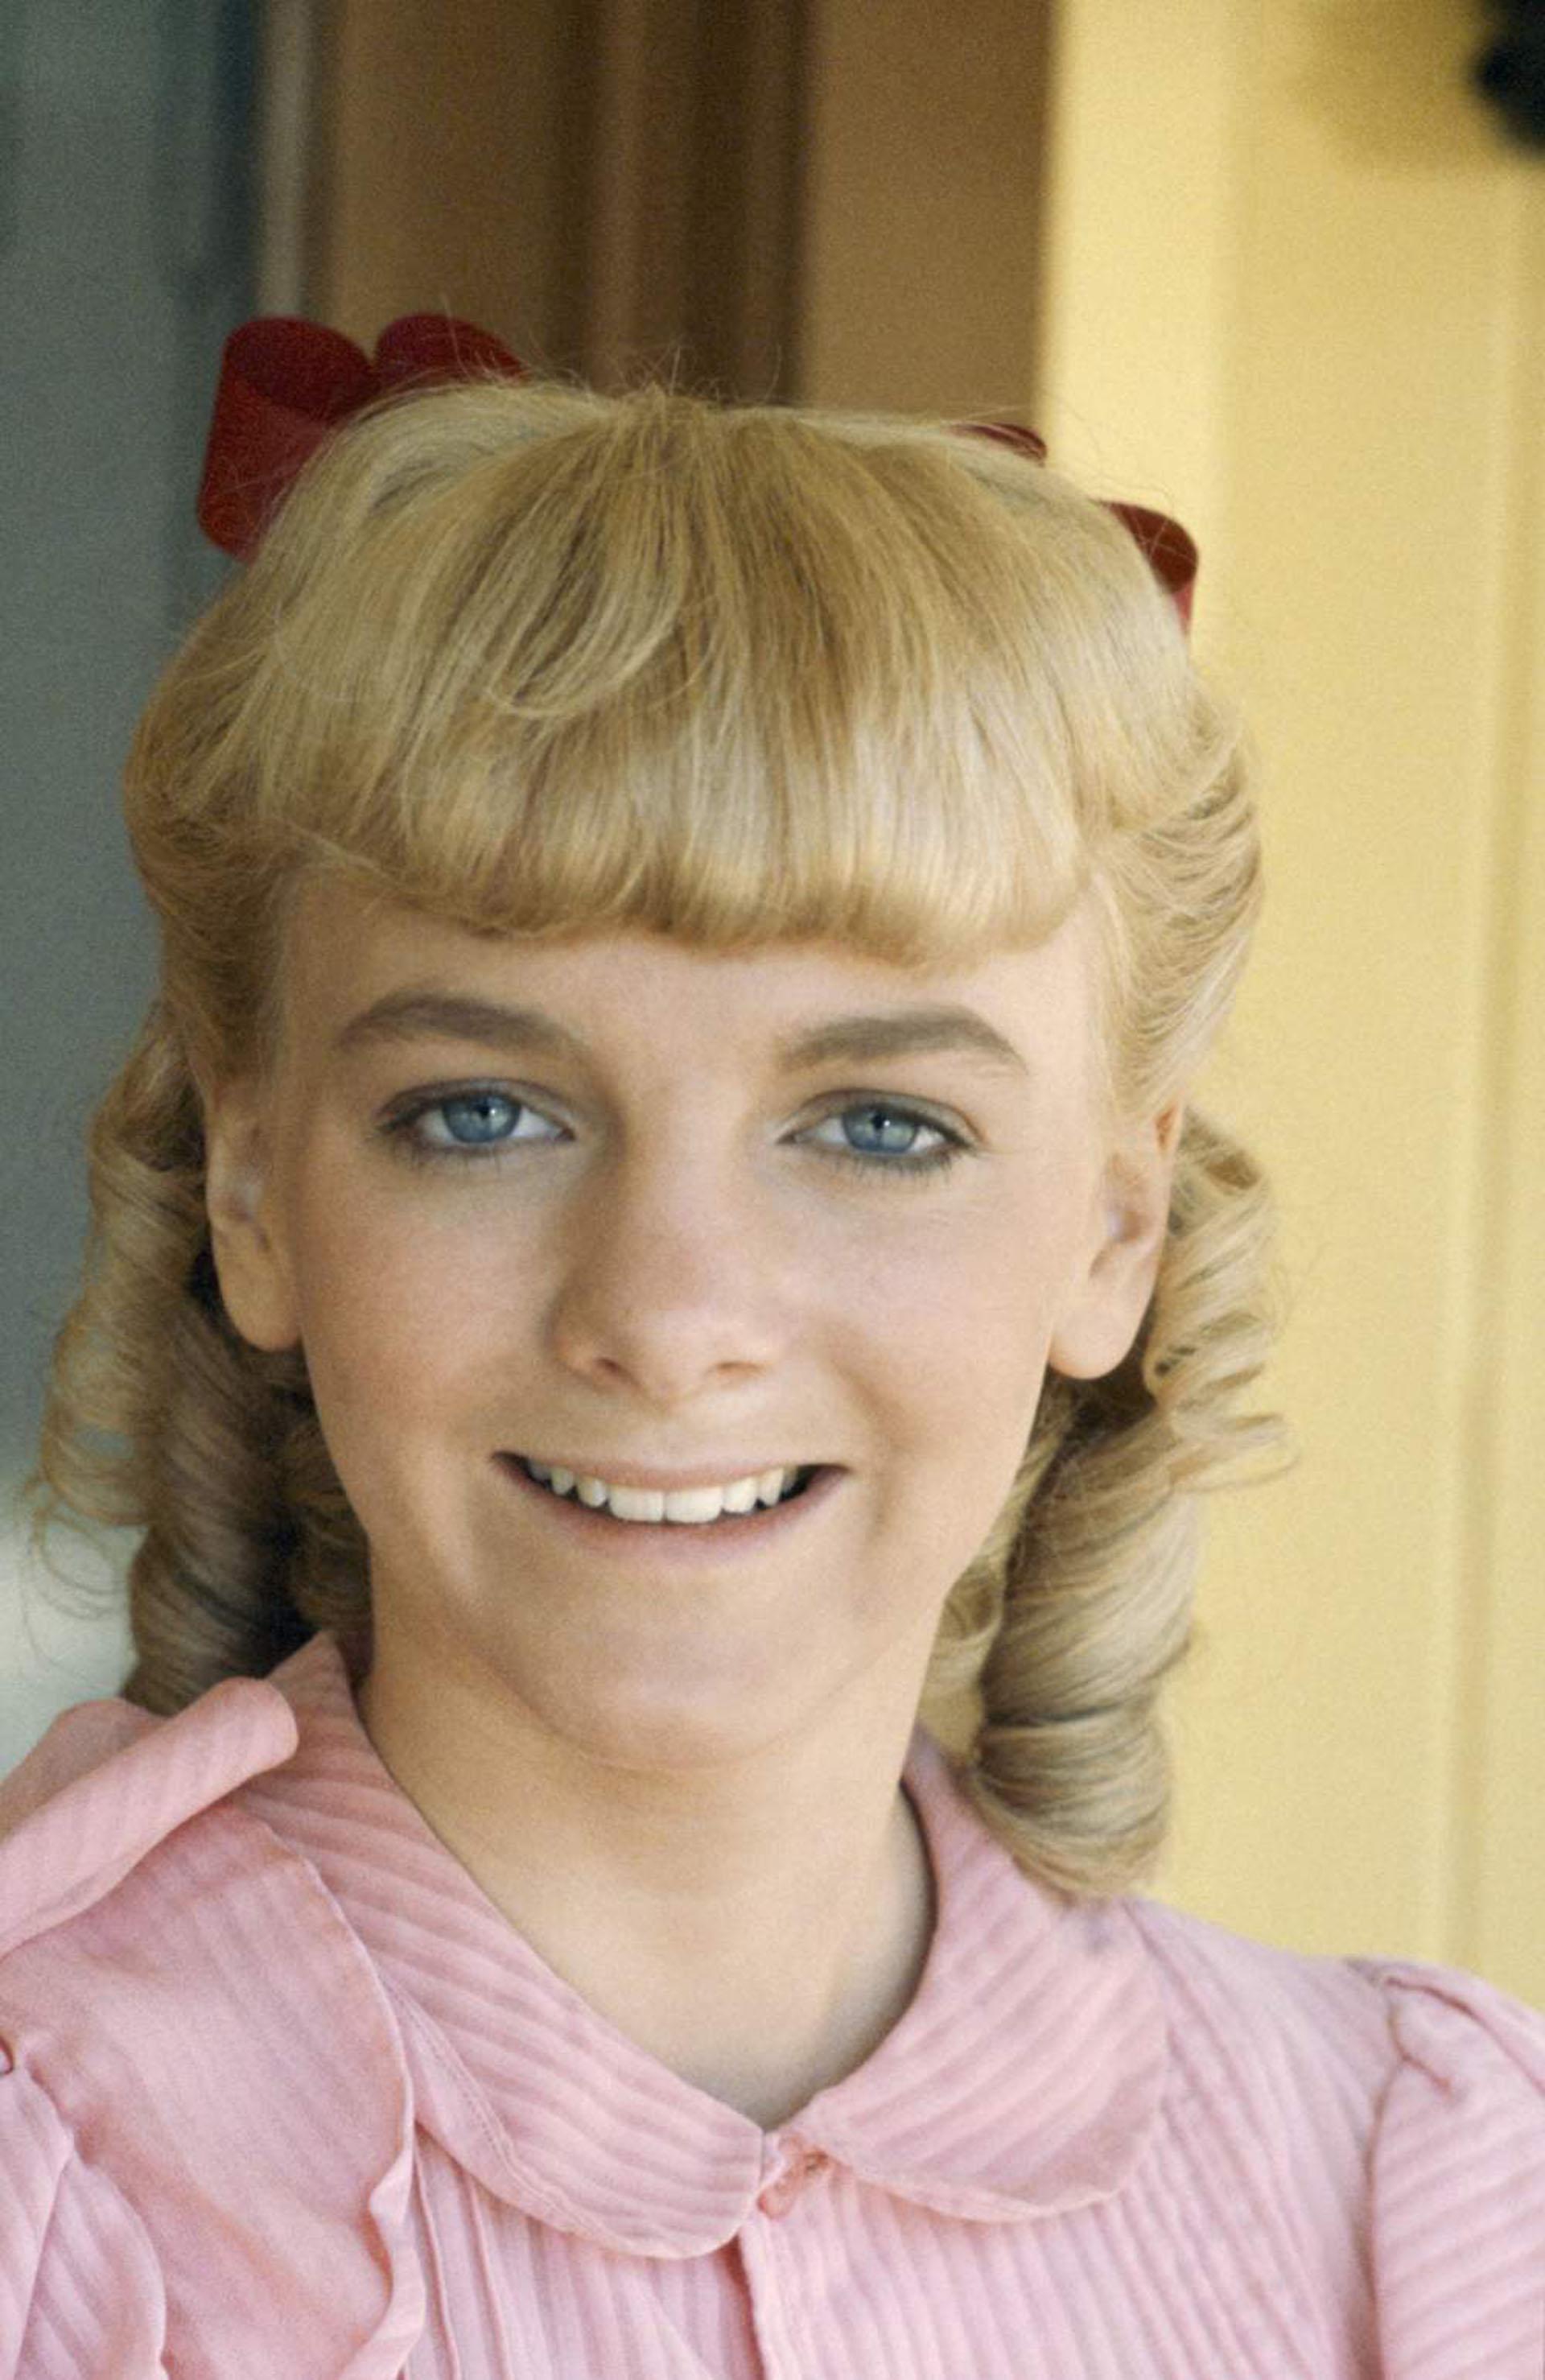 El personaje Nellie Oleson